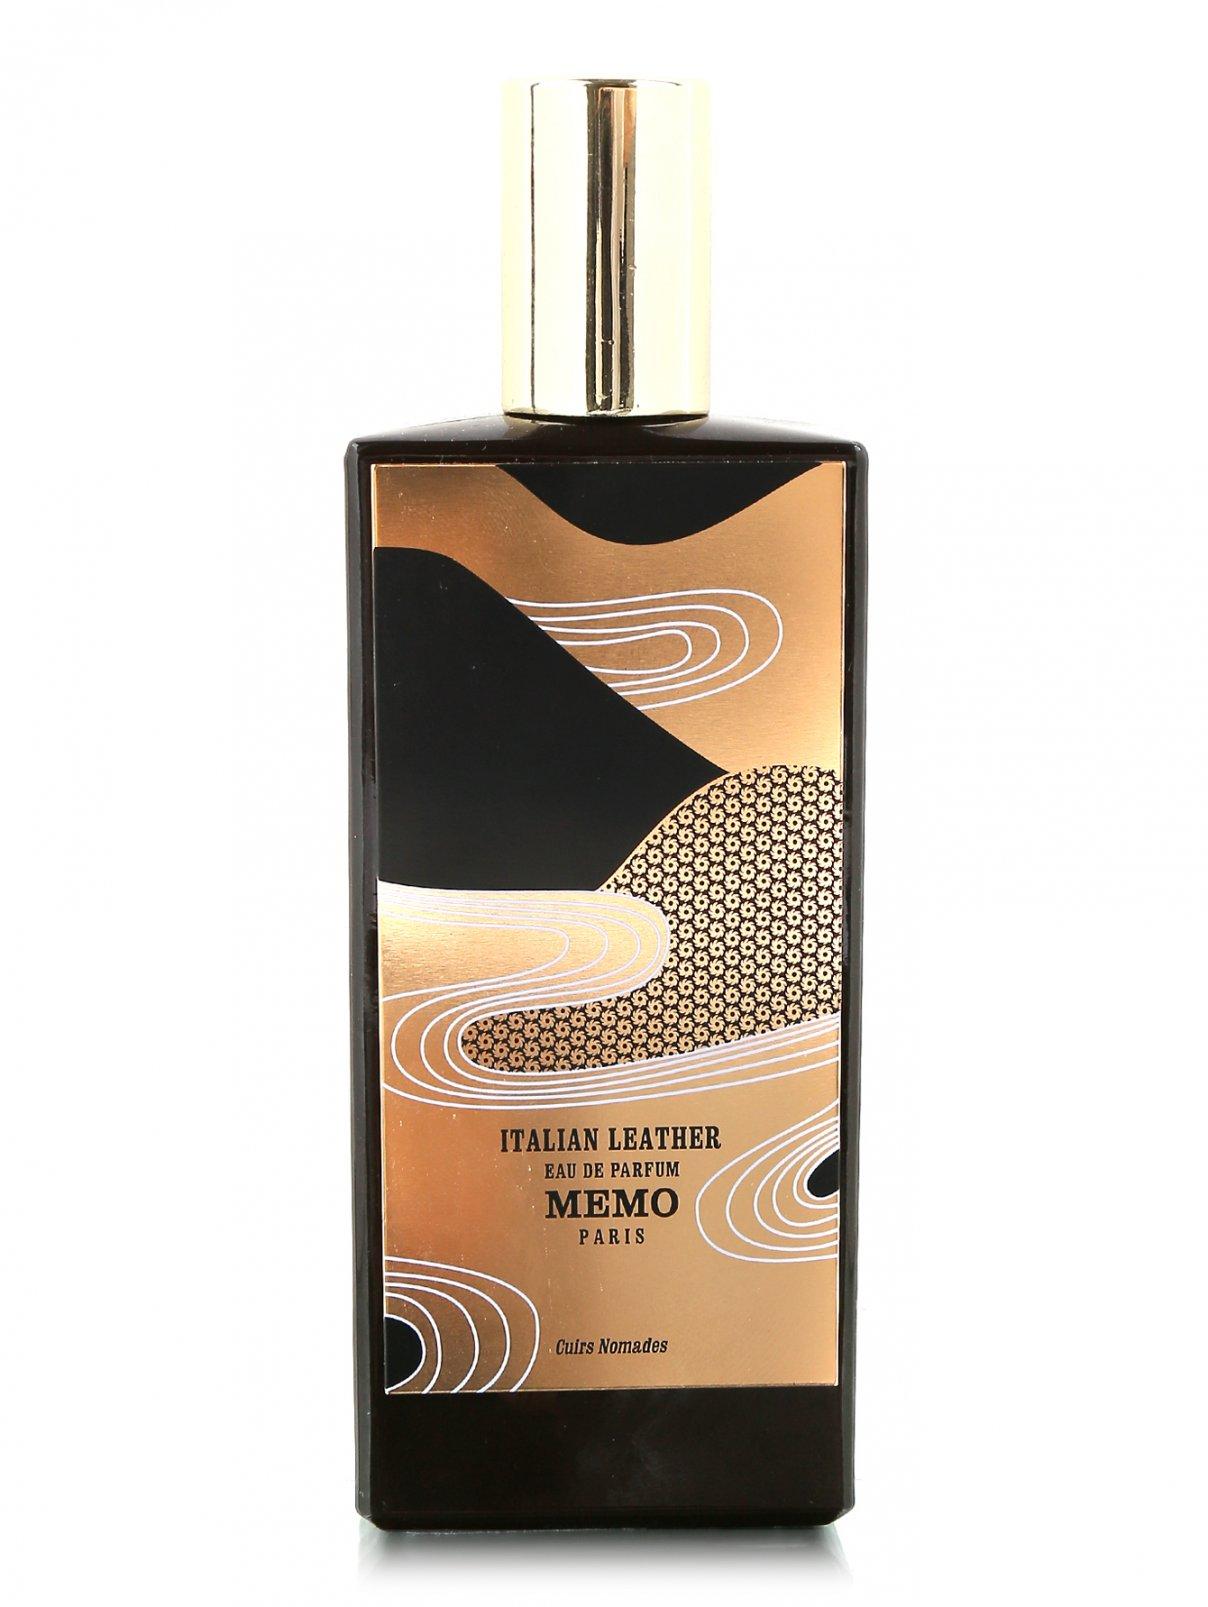 Парфюмерная вода 75 мл Italian Leather Memo Paris  –  Общий вид